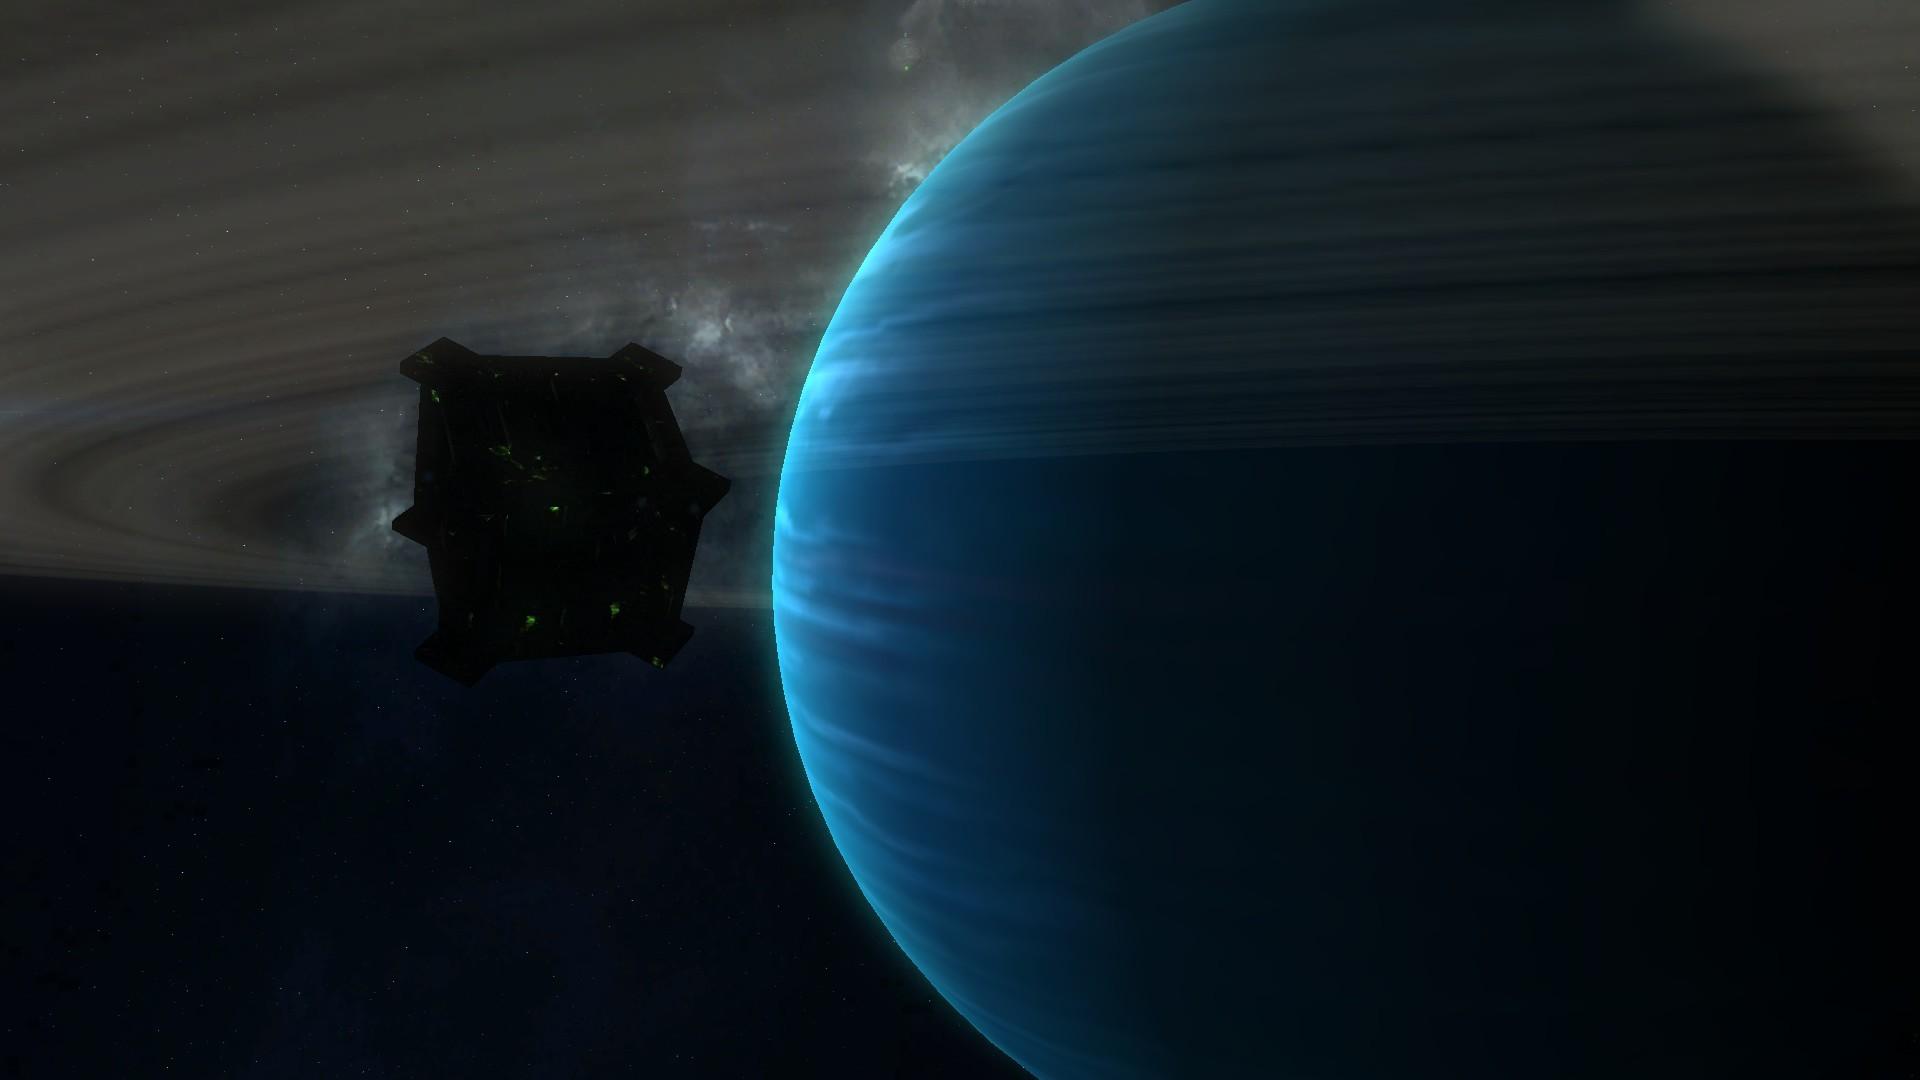 Report RSS The Borg probing Uranus (view original)